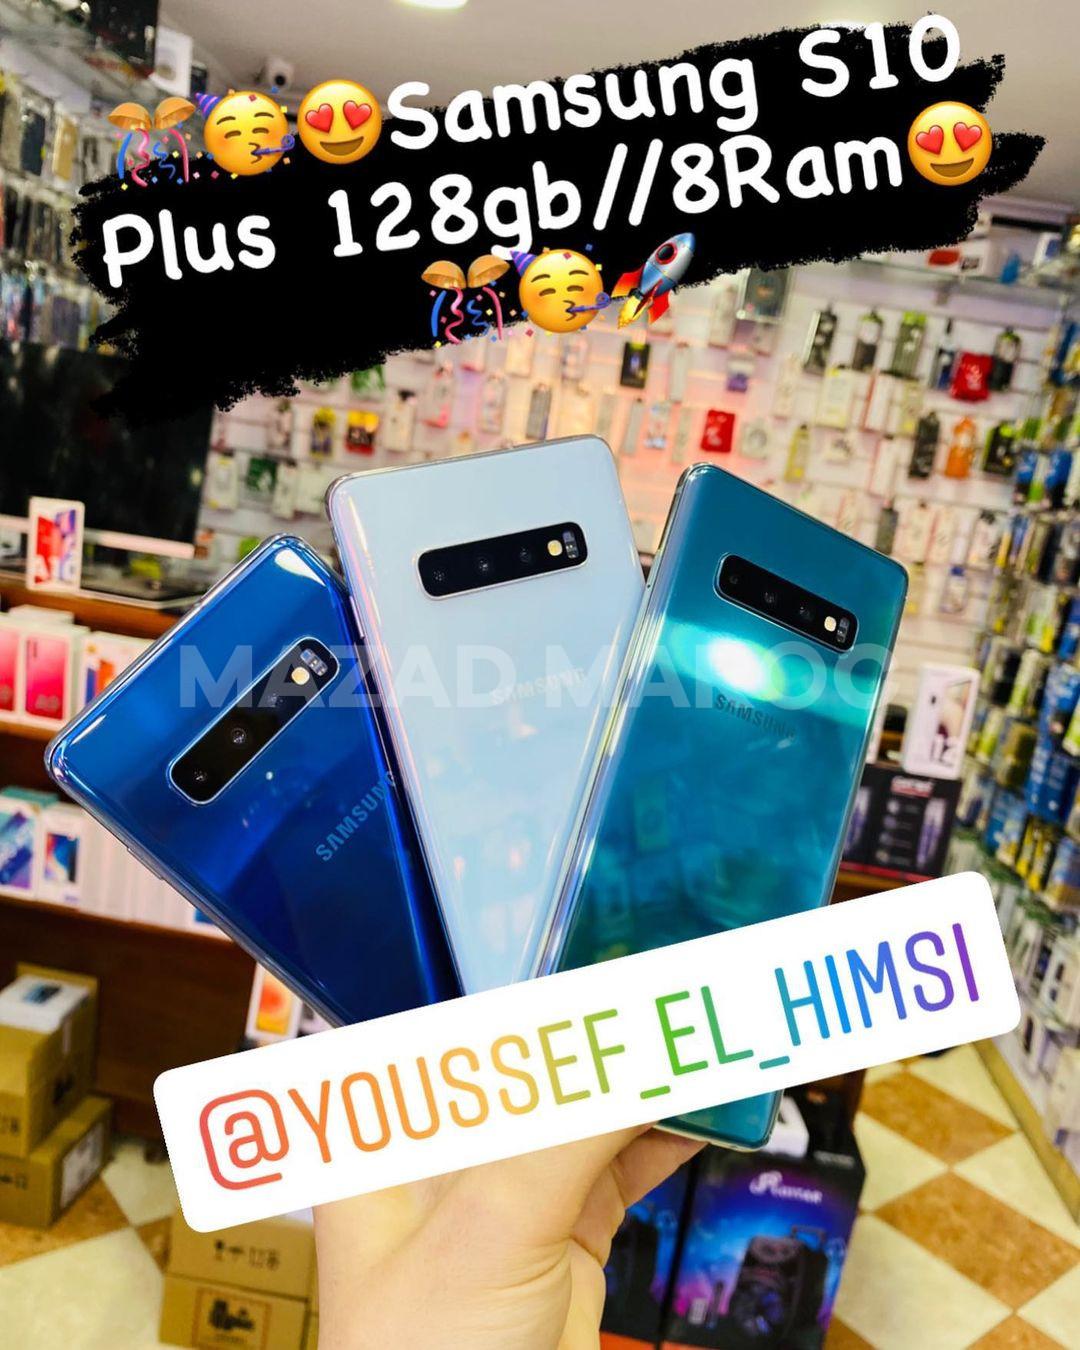 Vente Samsung S10 plus 128gb 8RAm